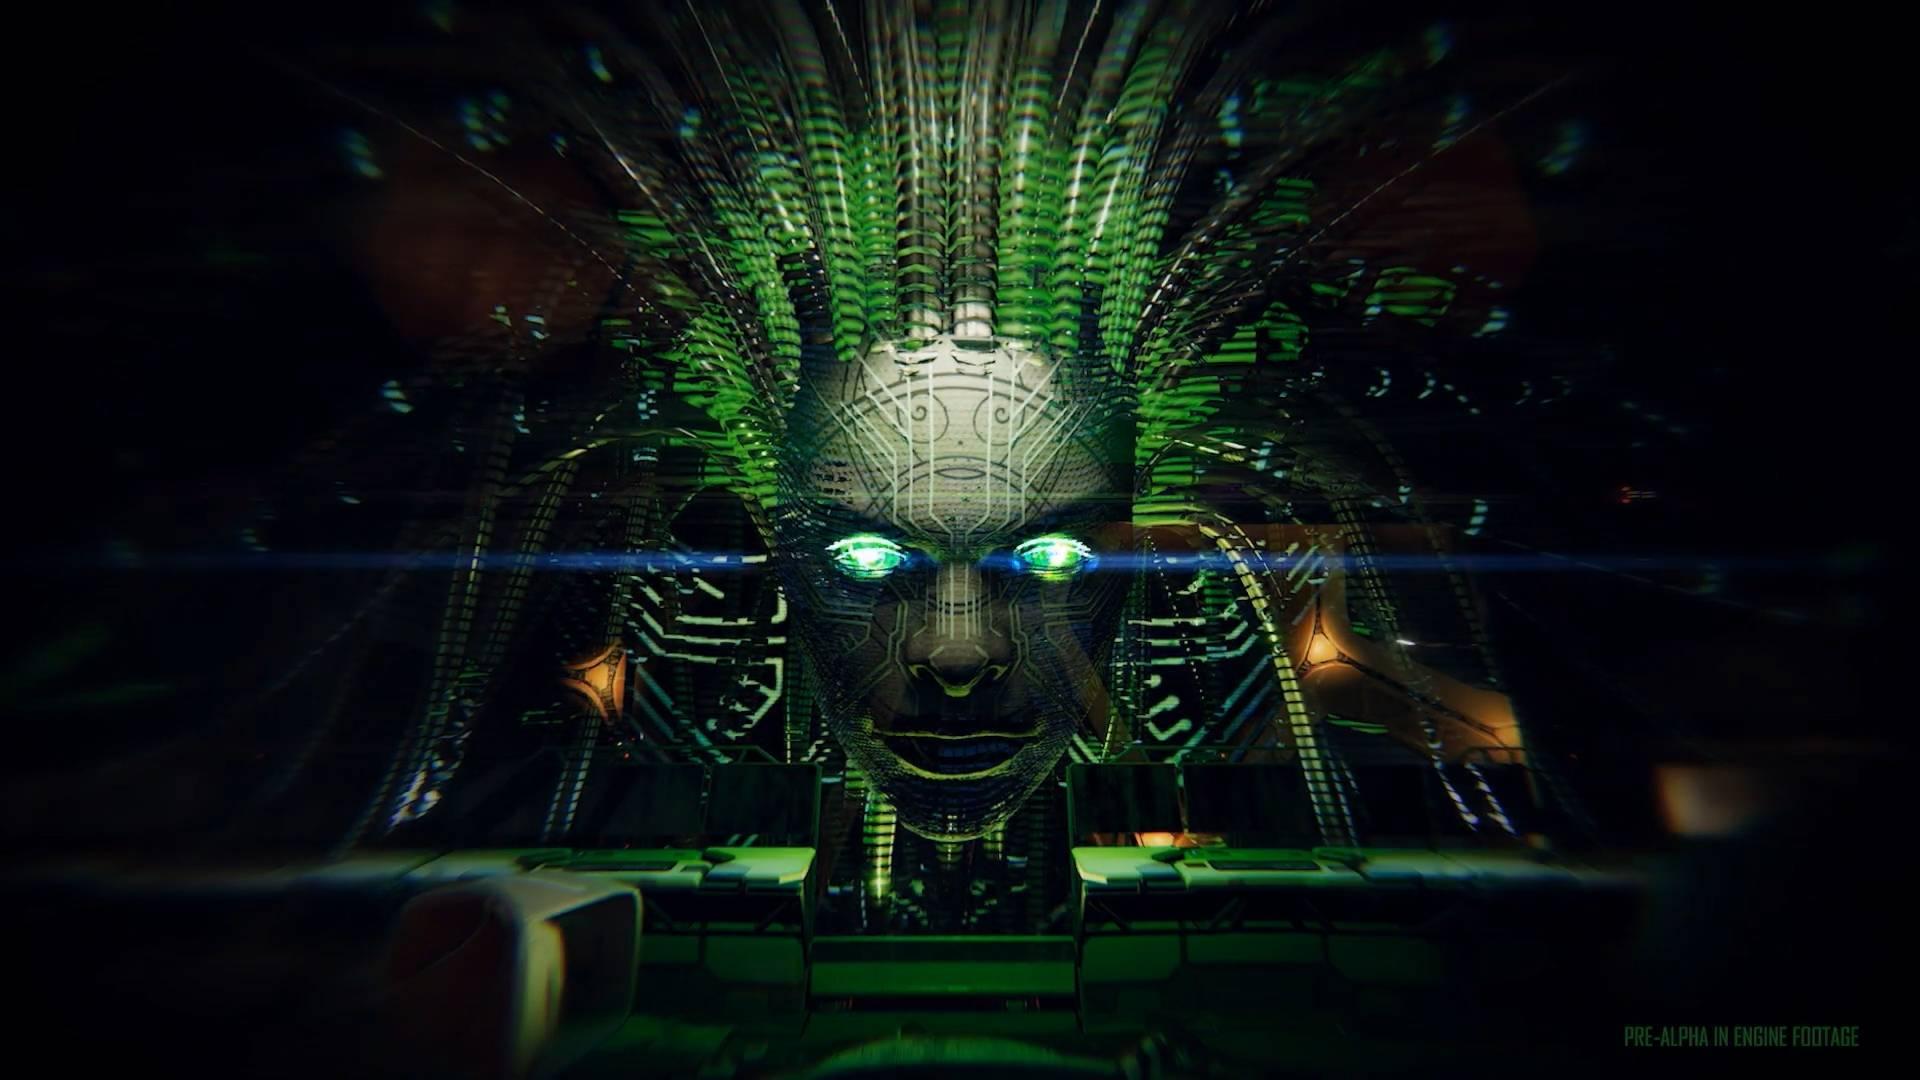 System Shock 3 Pre-alpha footage